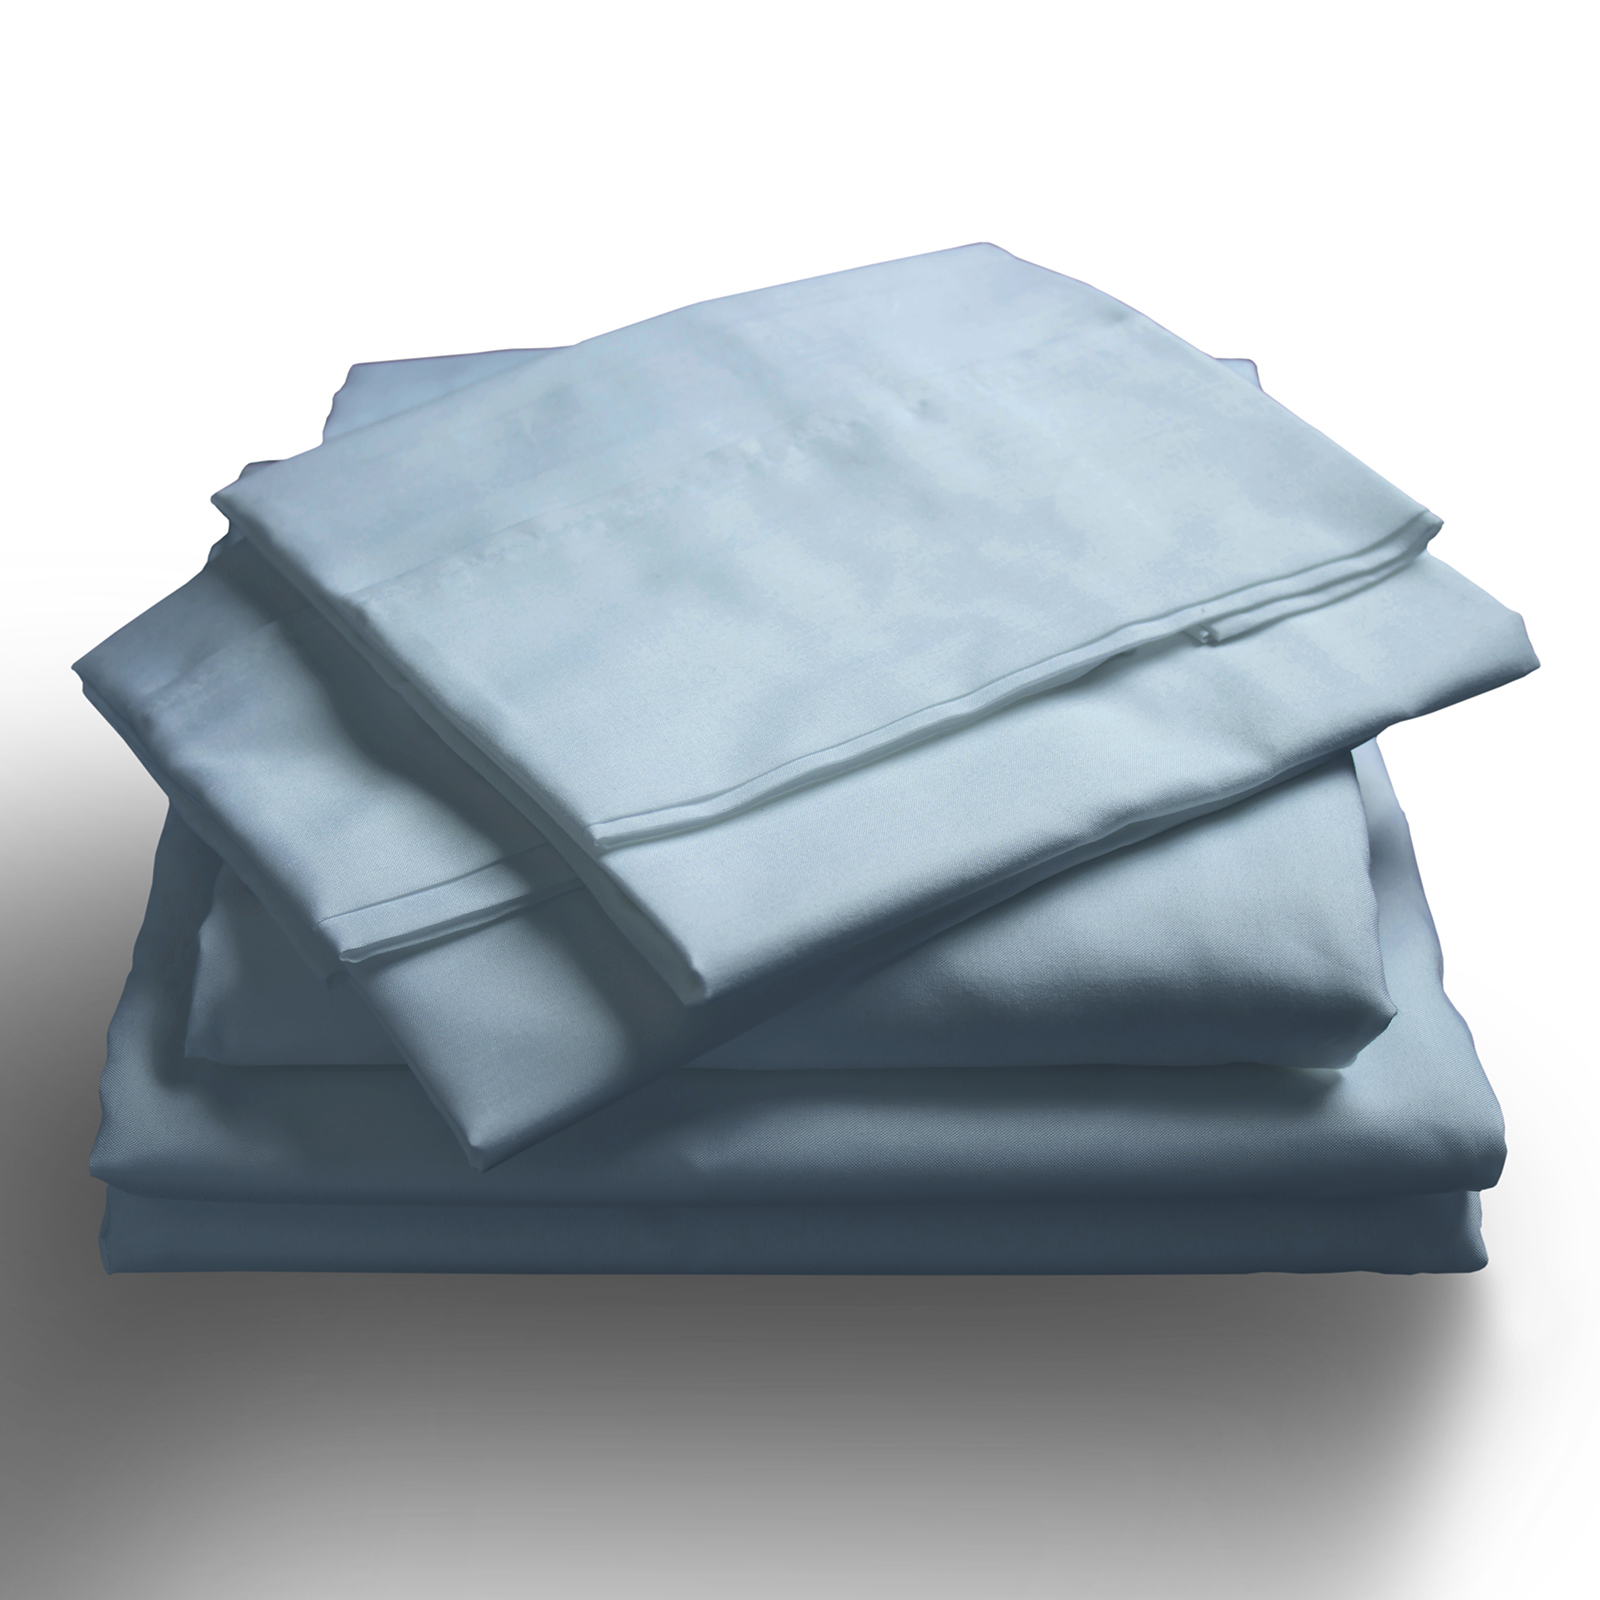 thumbnail 17 - Royal Comfort 1000TC Hotel Grade Bamboo Cotton Sheets Pillowcases Set Ultrasoft